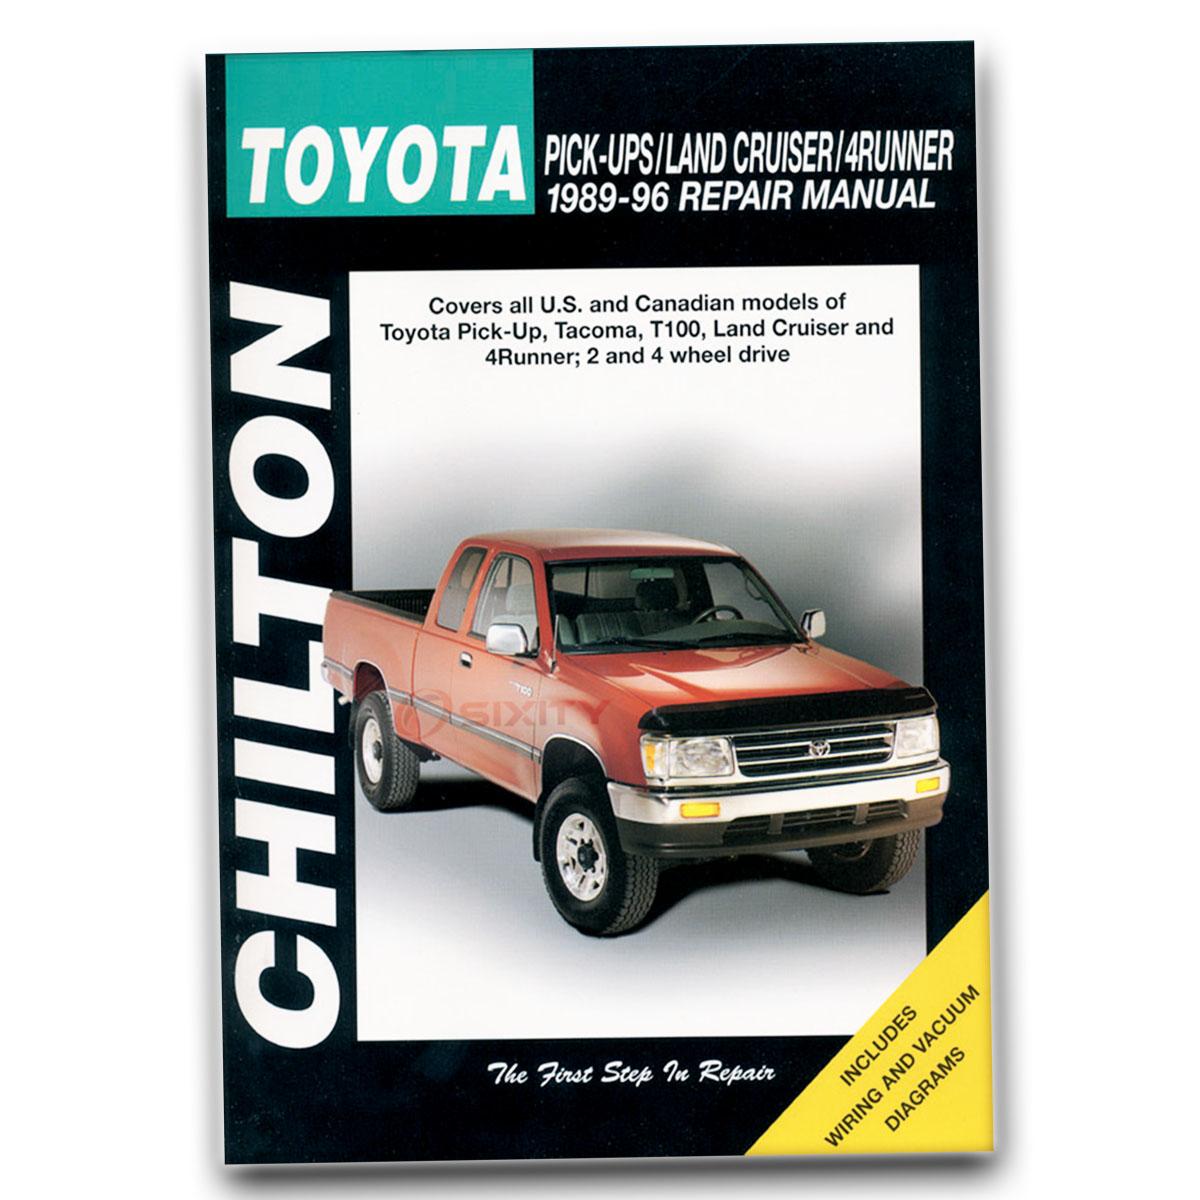 Toyota 4Runner Chilton Repair Manual SR5 Base Limited DLX Shop Service af